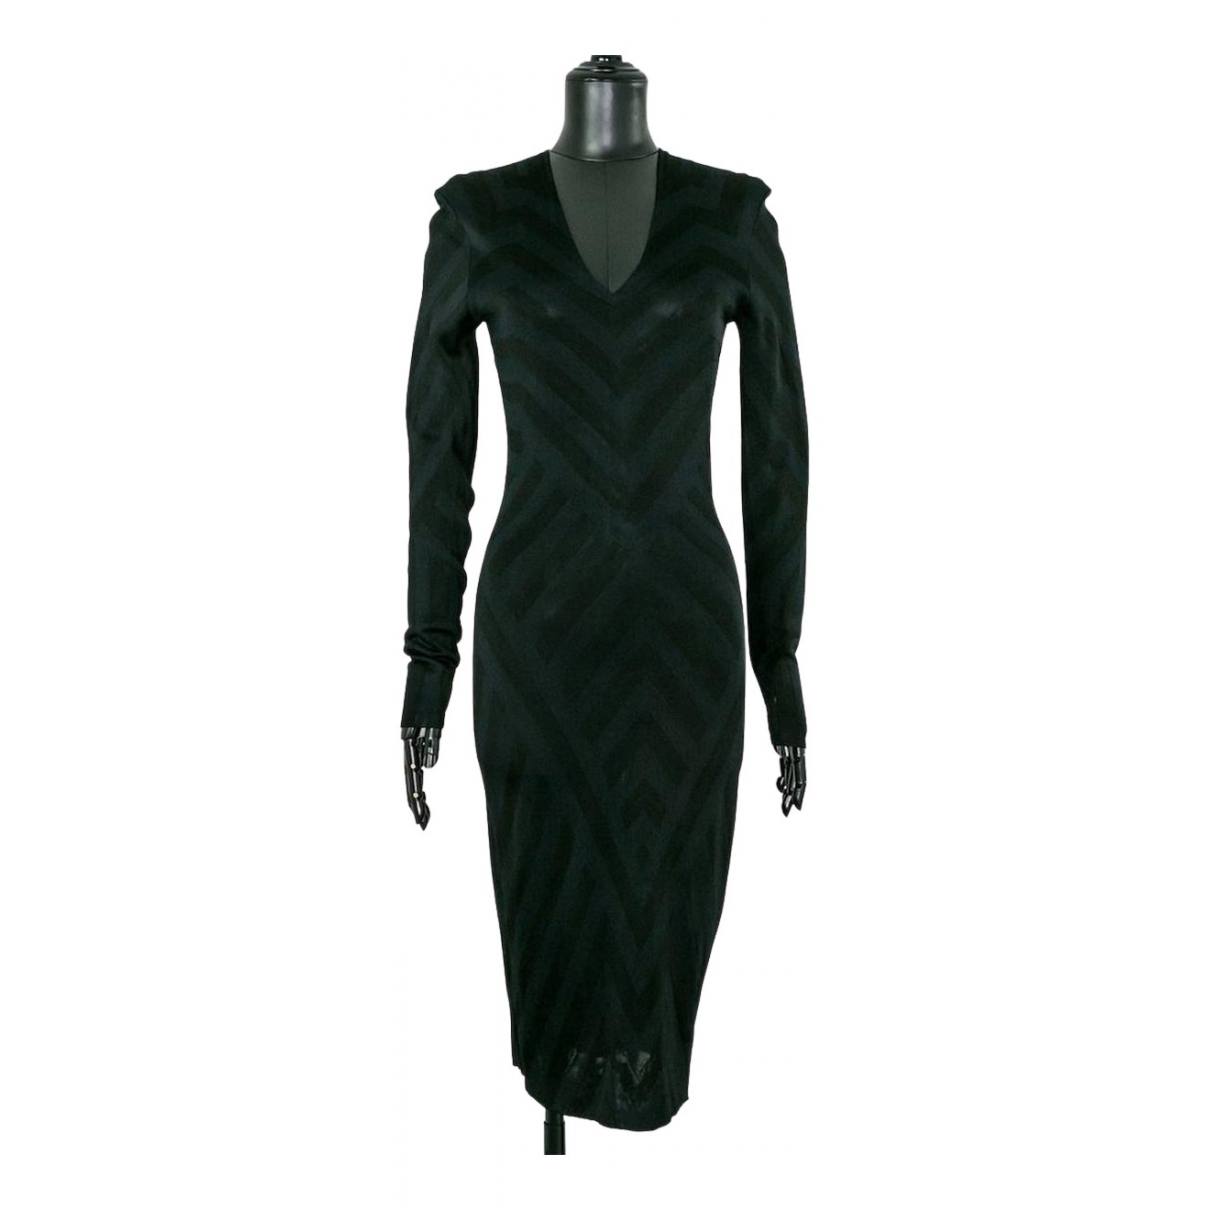 Alexander Mcqueen \N Kleid in  Schwarz Baumwolle - Elasthan